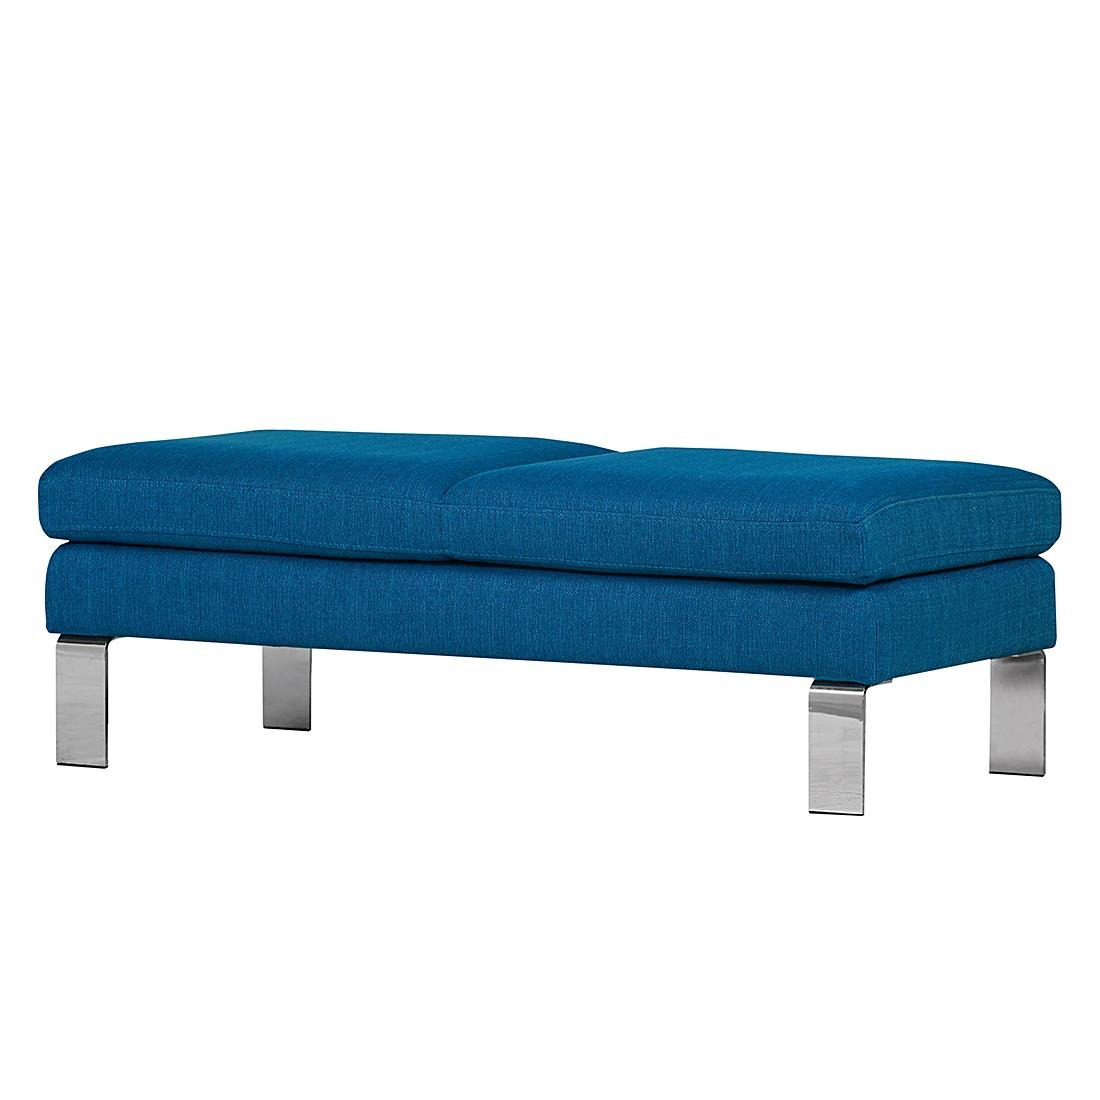 Sitzbank Siny – Strukturstoff Blau, loftscape günstig